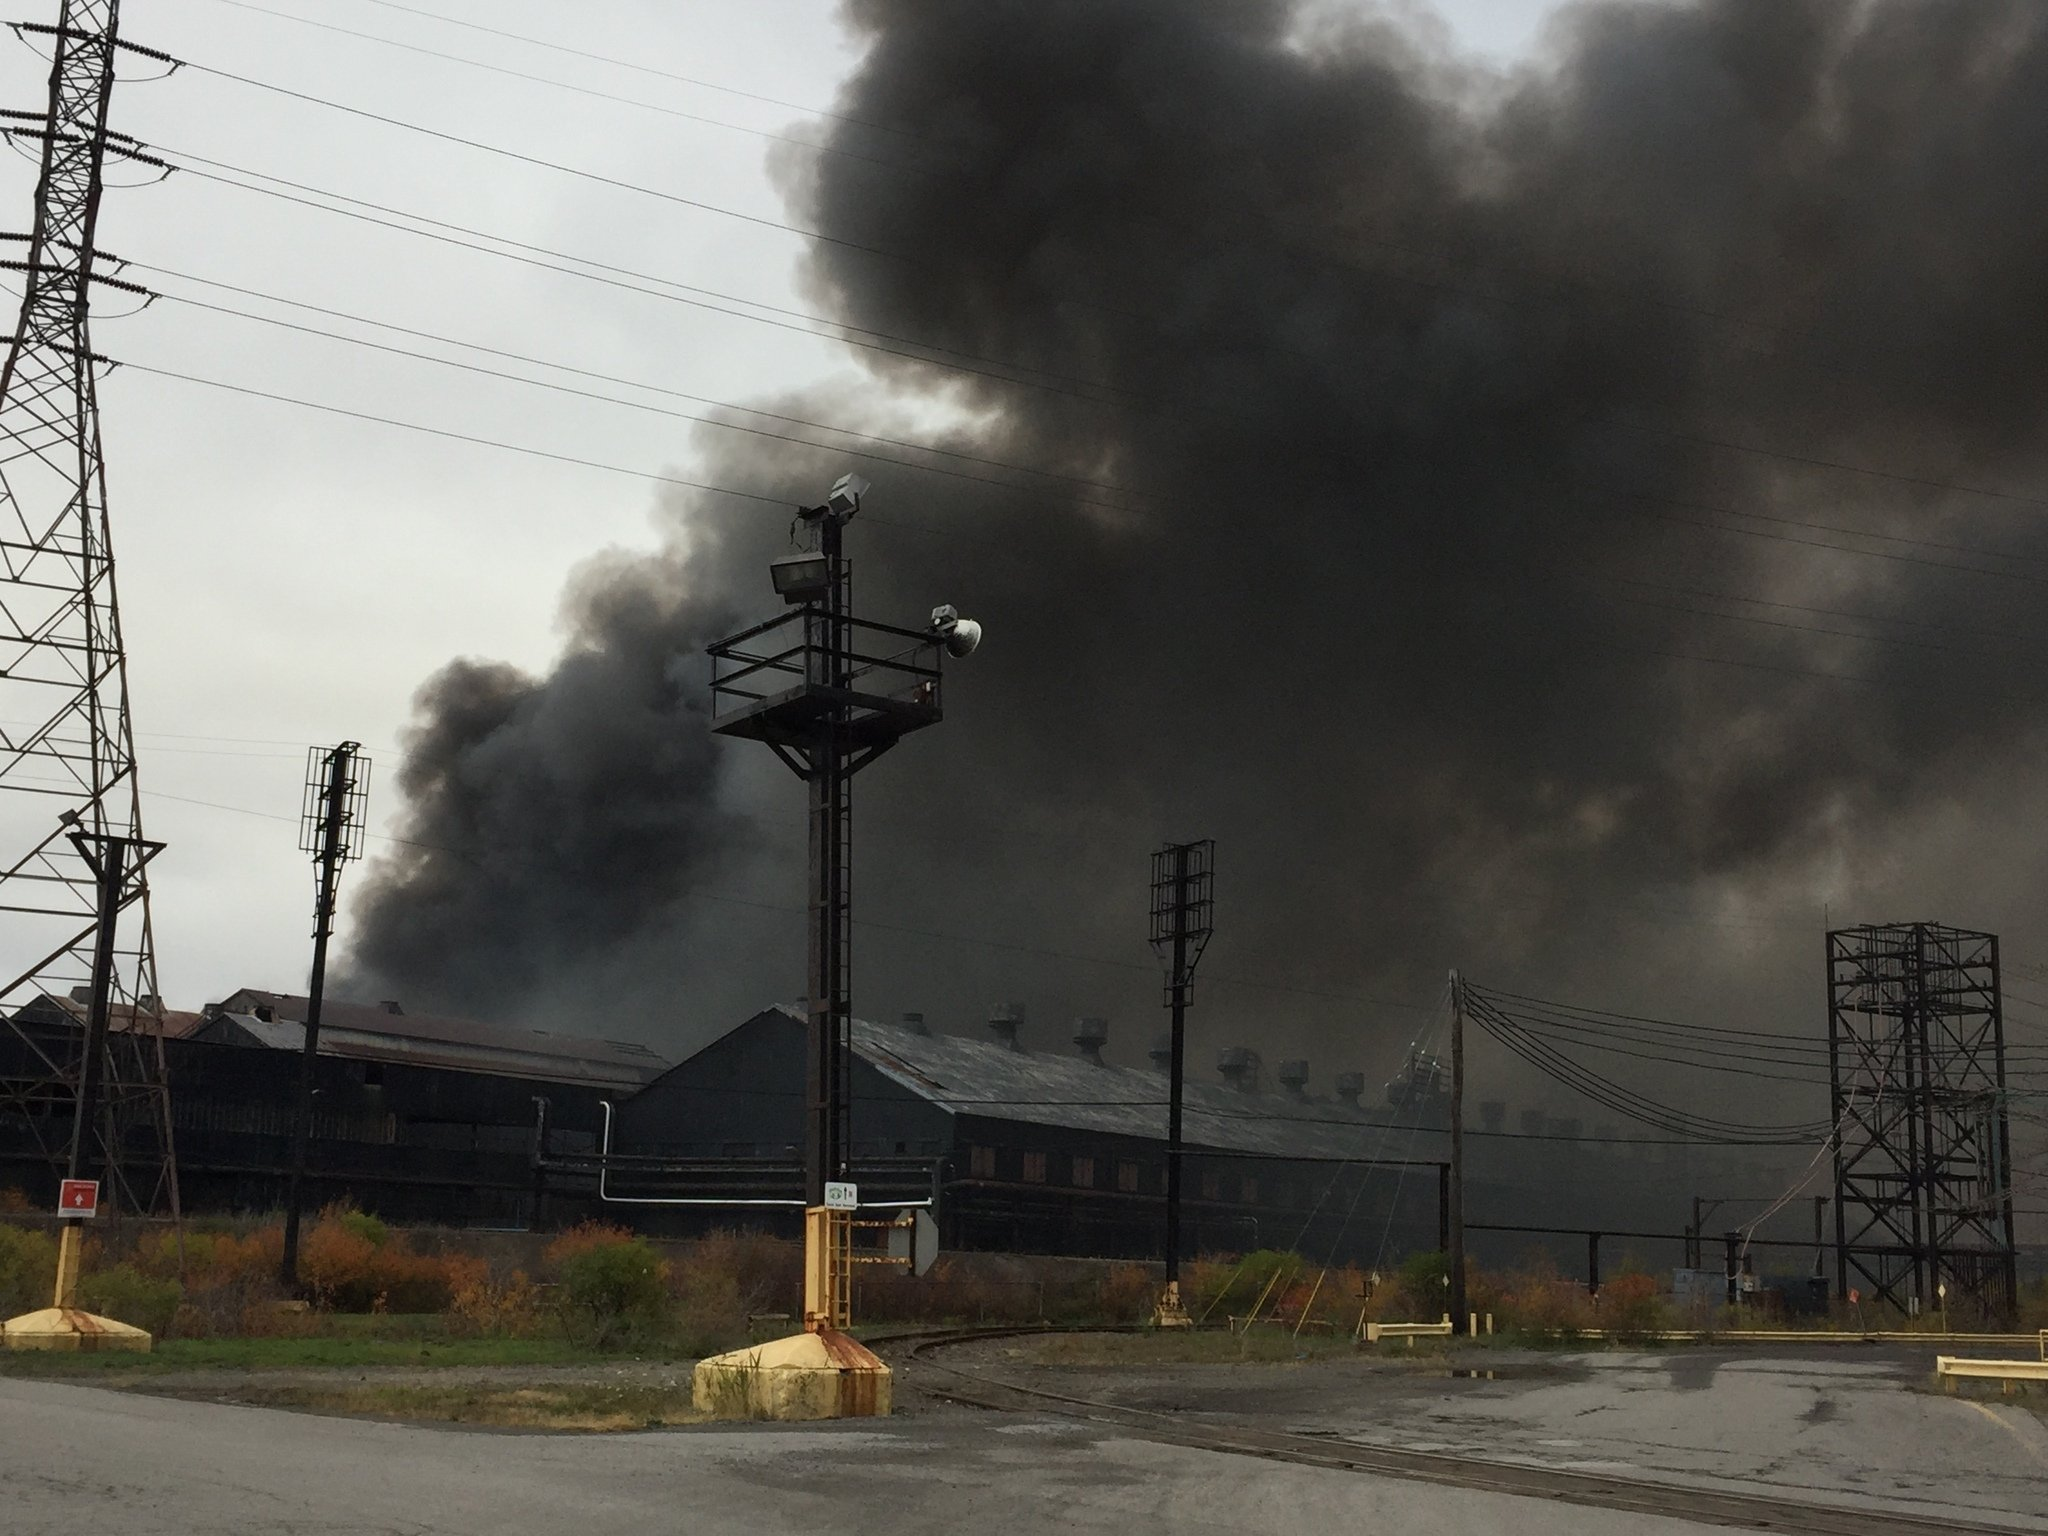 Bethlehem Steel Fire 6 City Blocks Burn Near Buffalo Plume Could